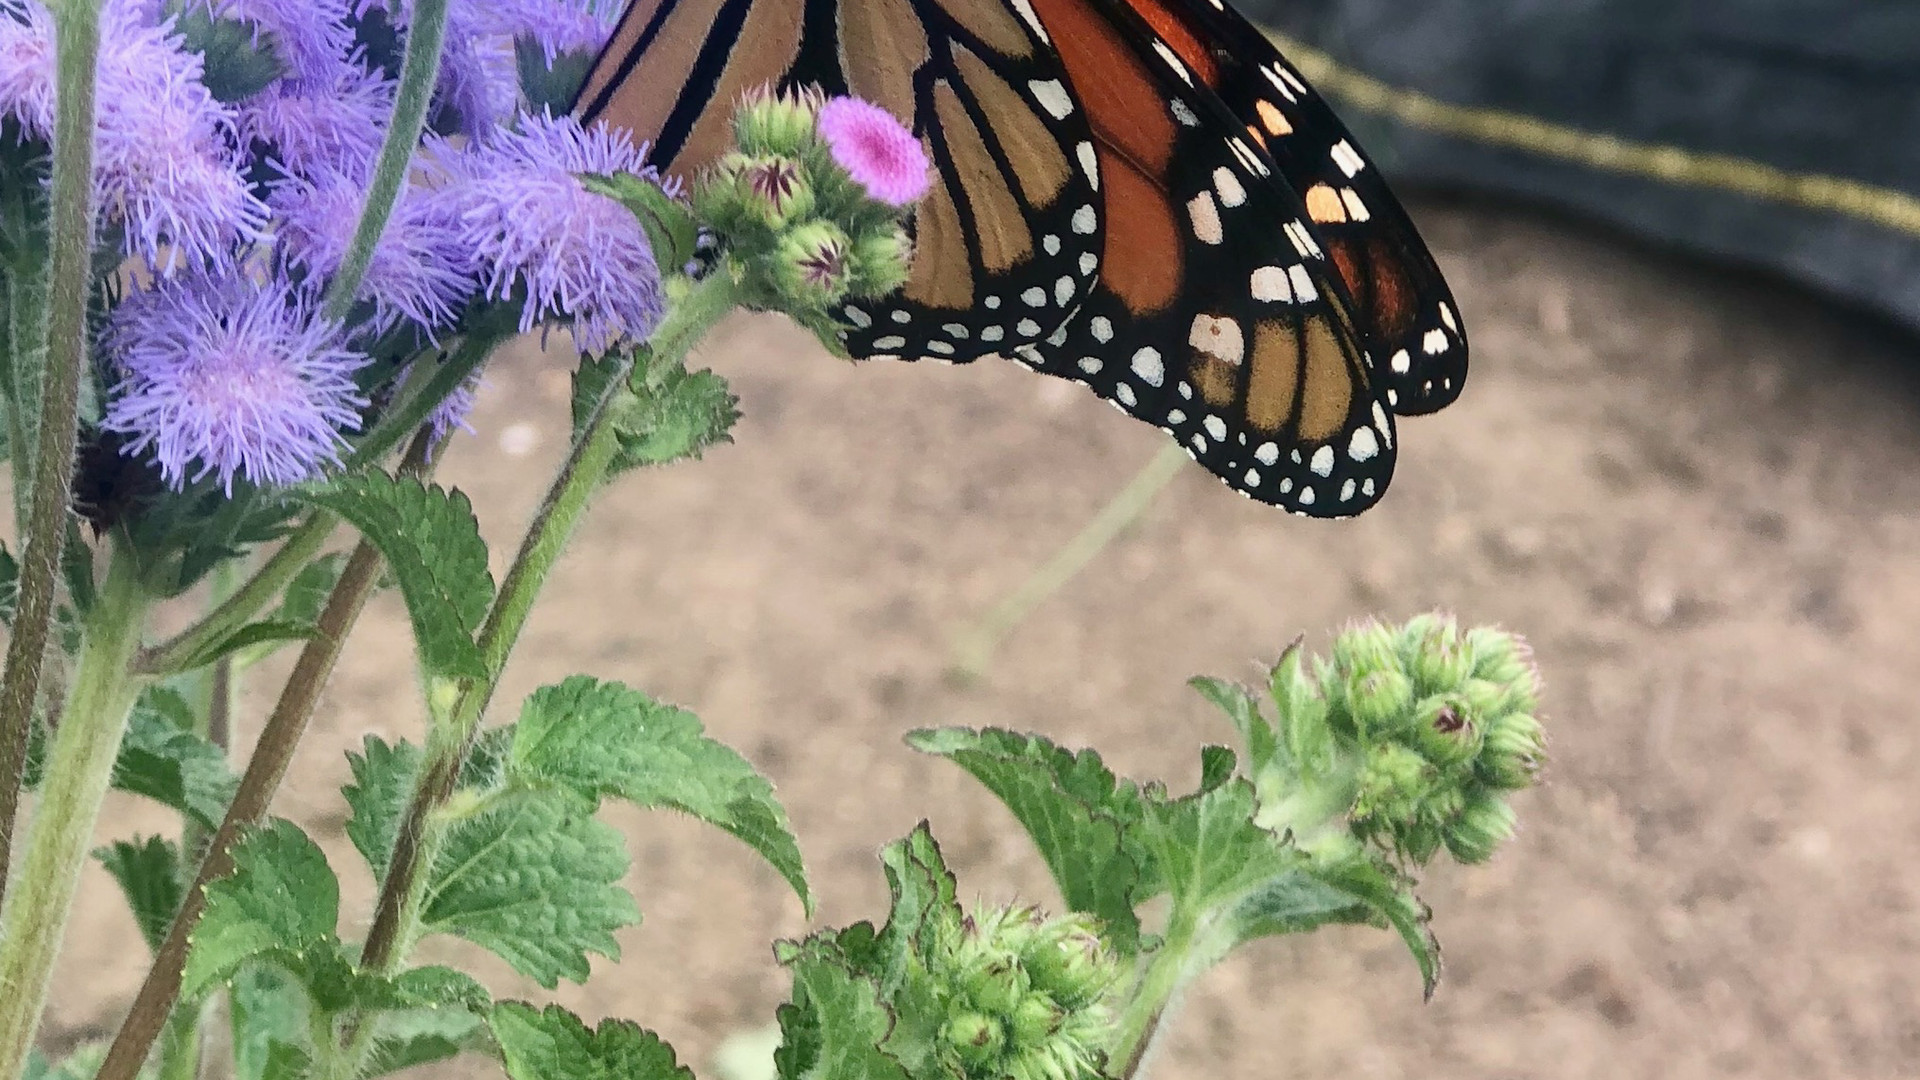 Butterflies amongst our flowers